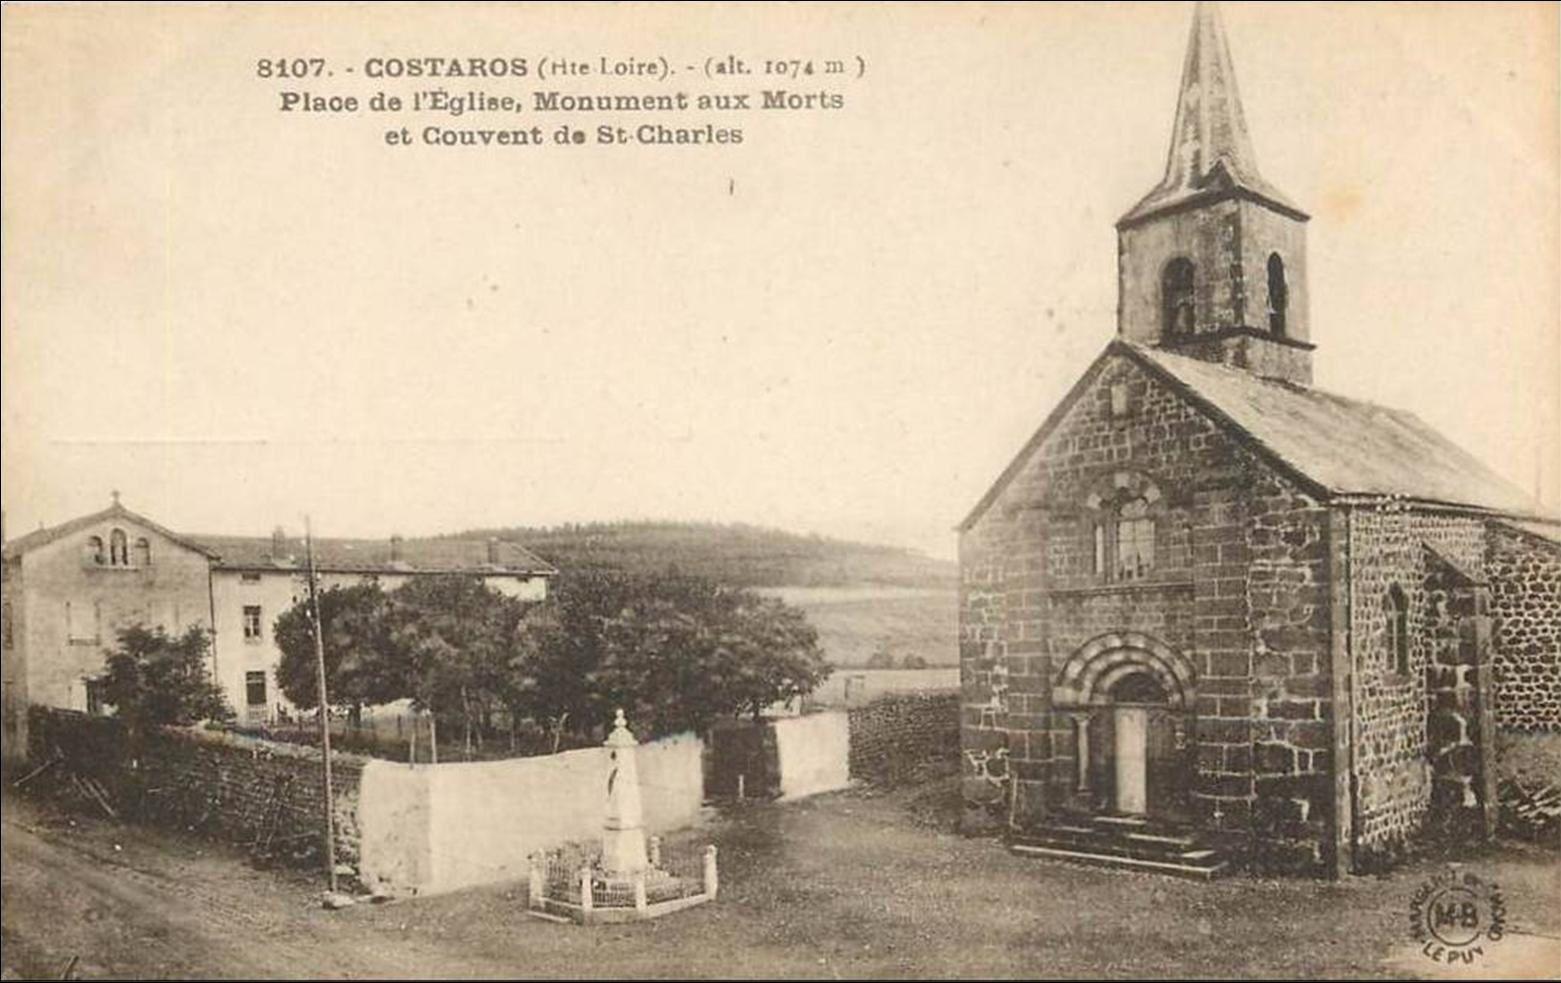 Costaros